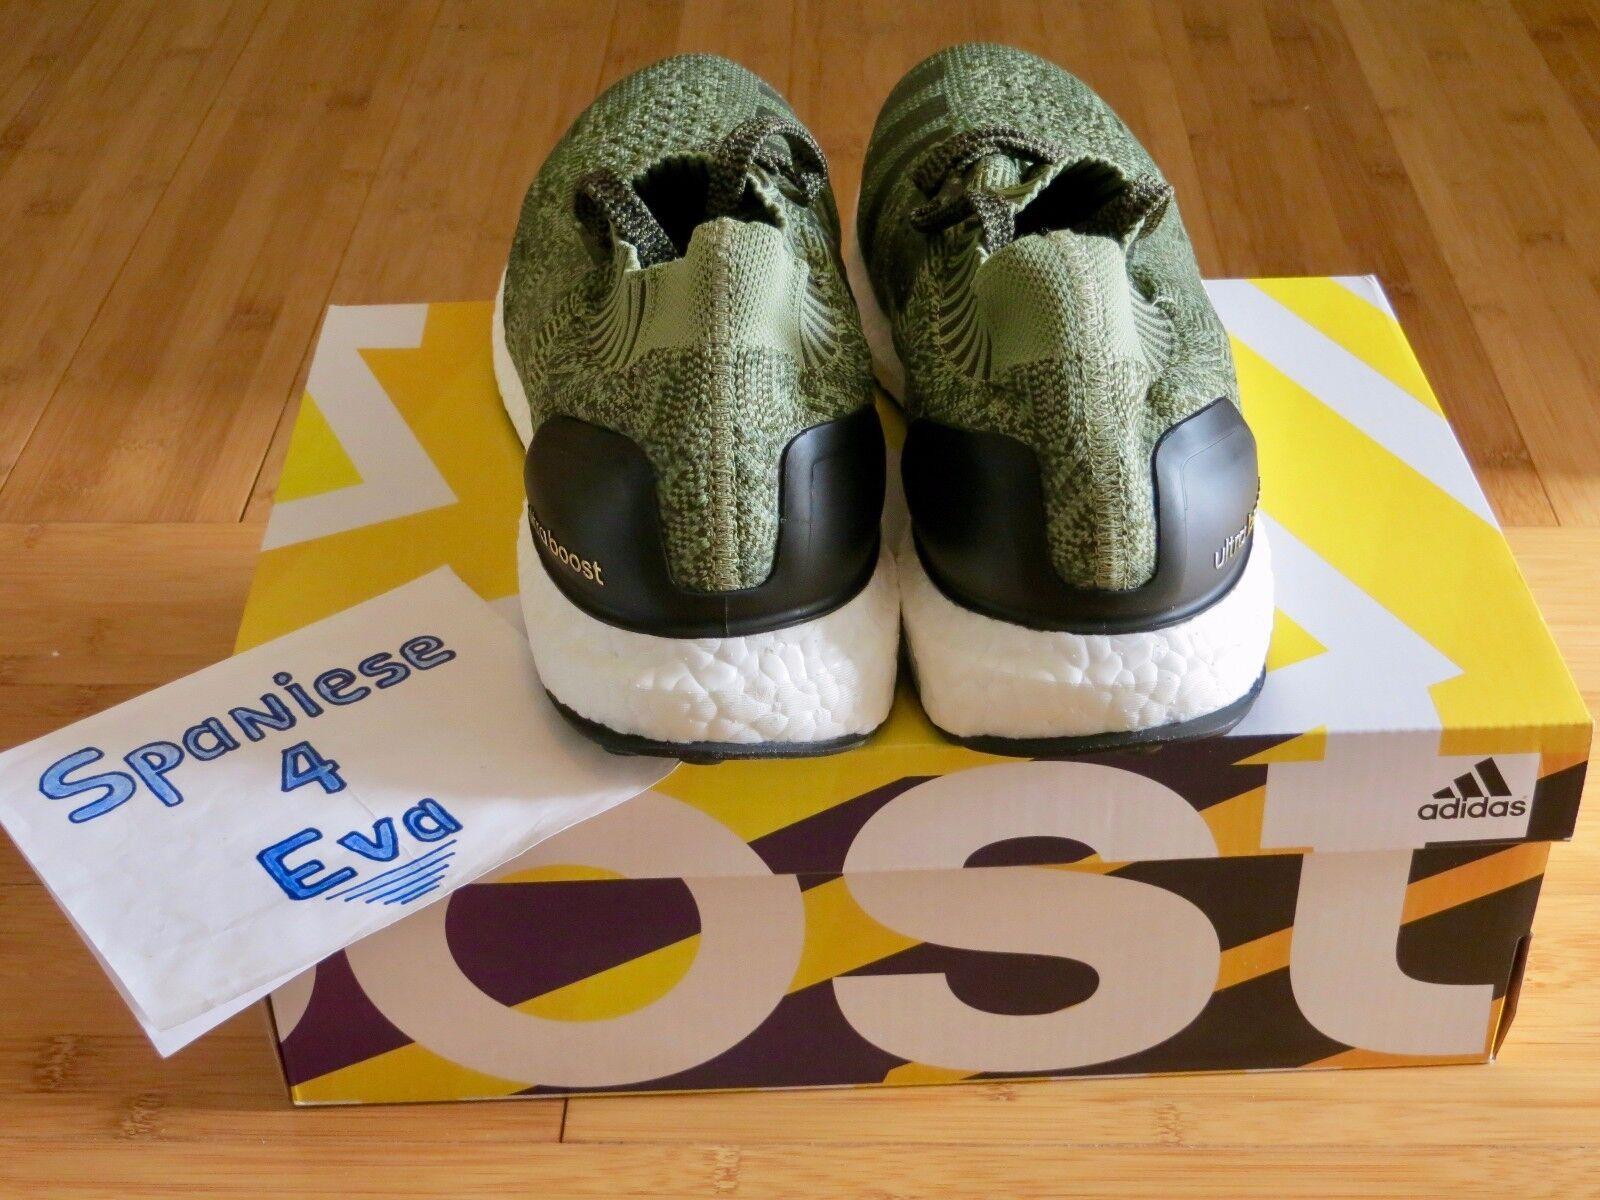 Adidas ultra impulso 9.5 senza freni oliva - bb3901 dimensioni 9.5 impulso 34a09f